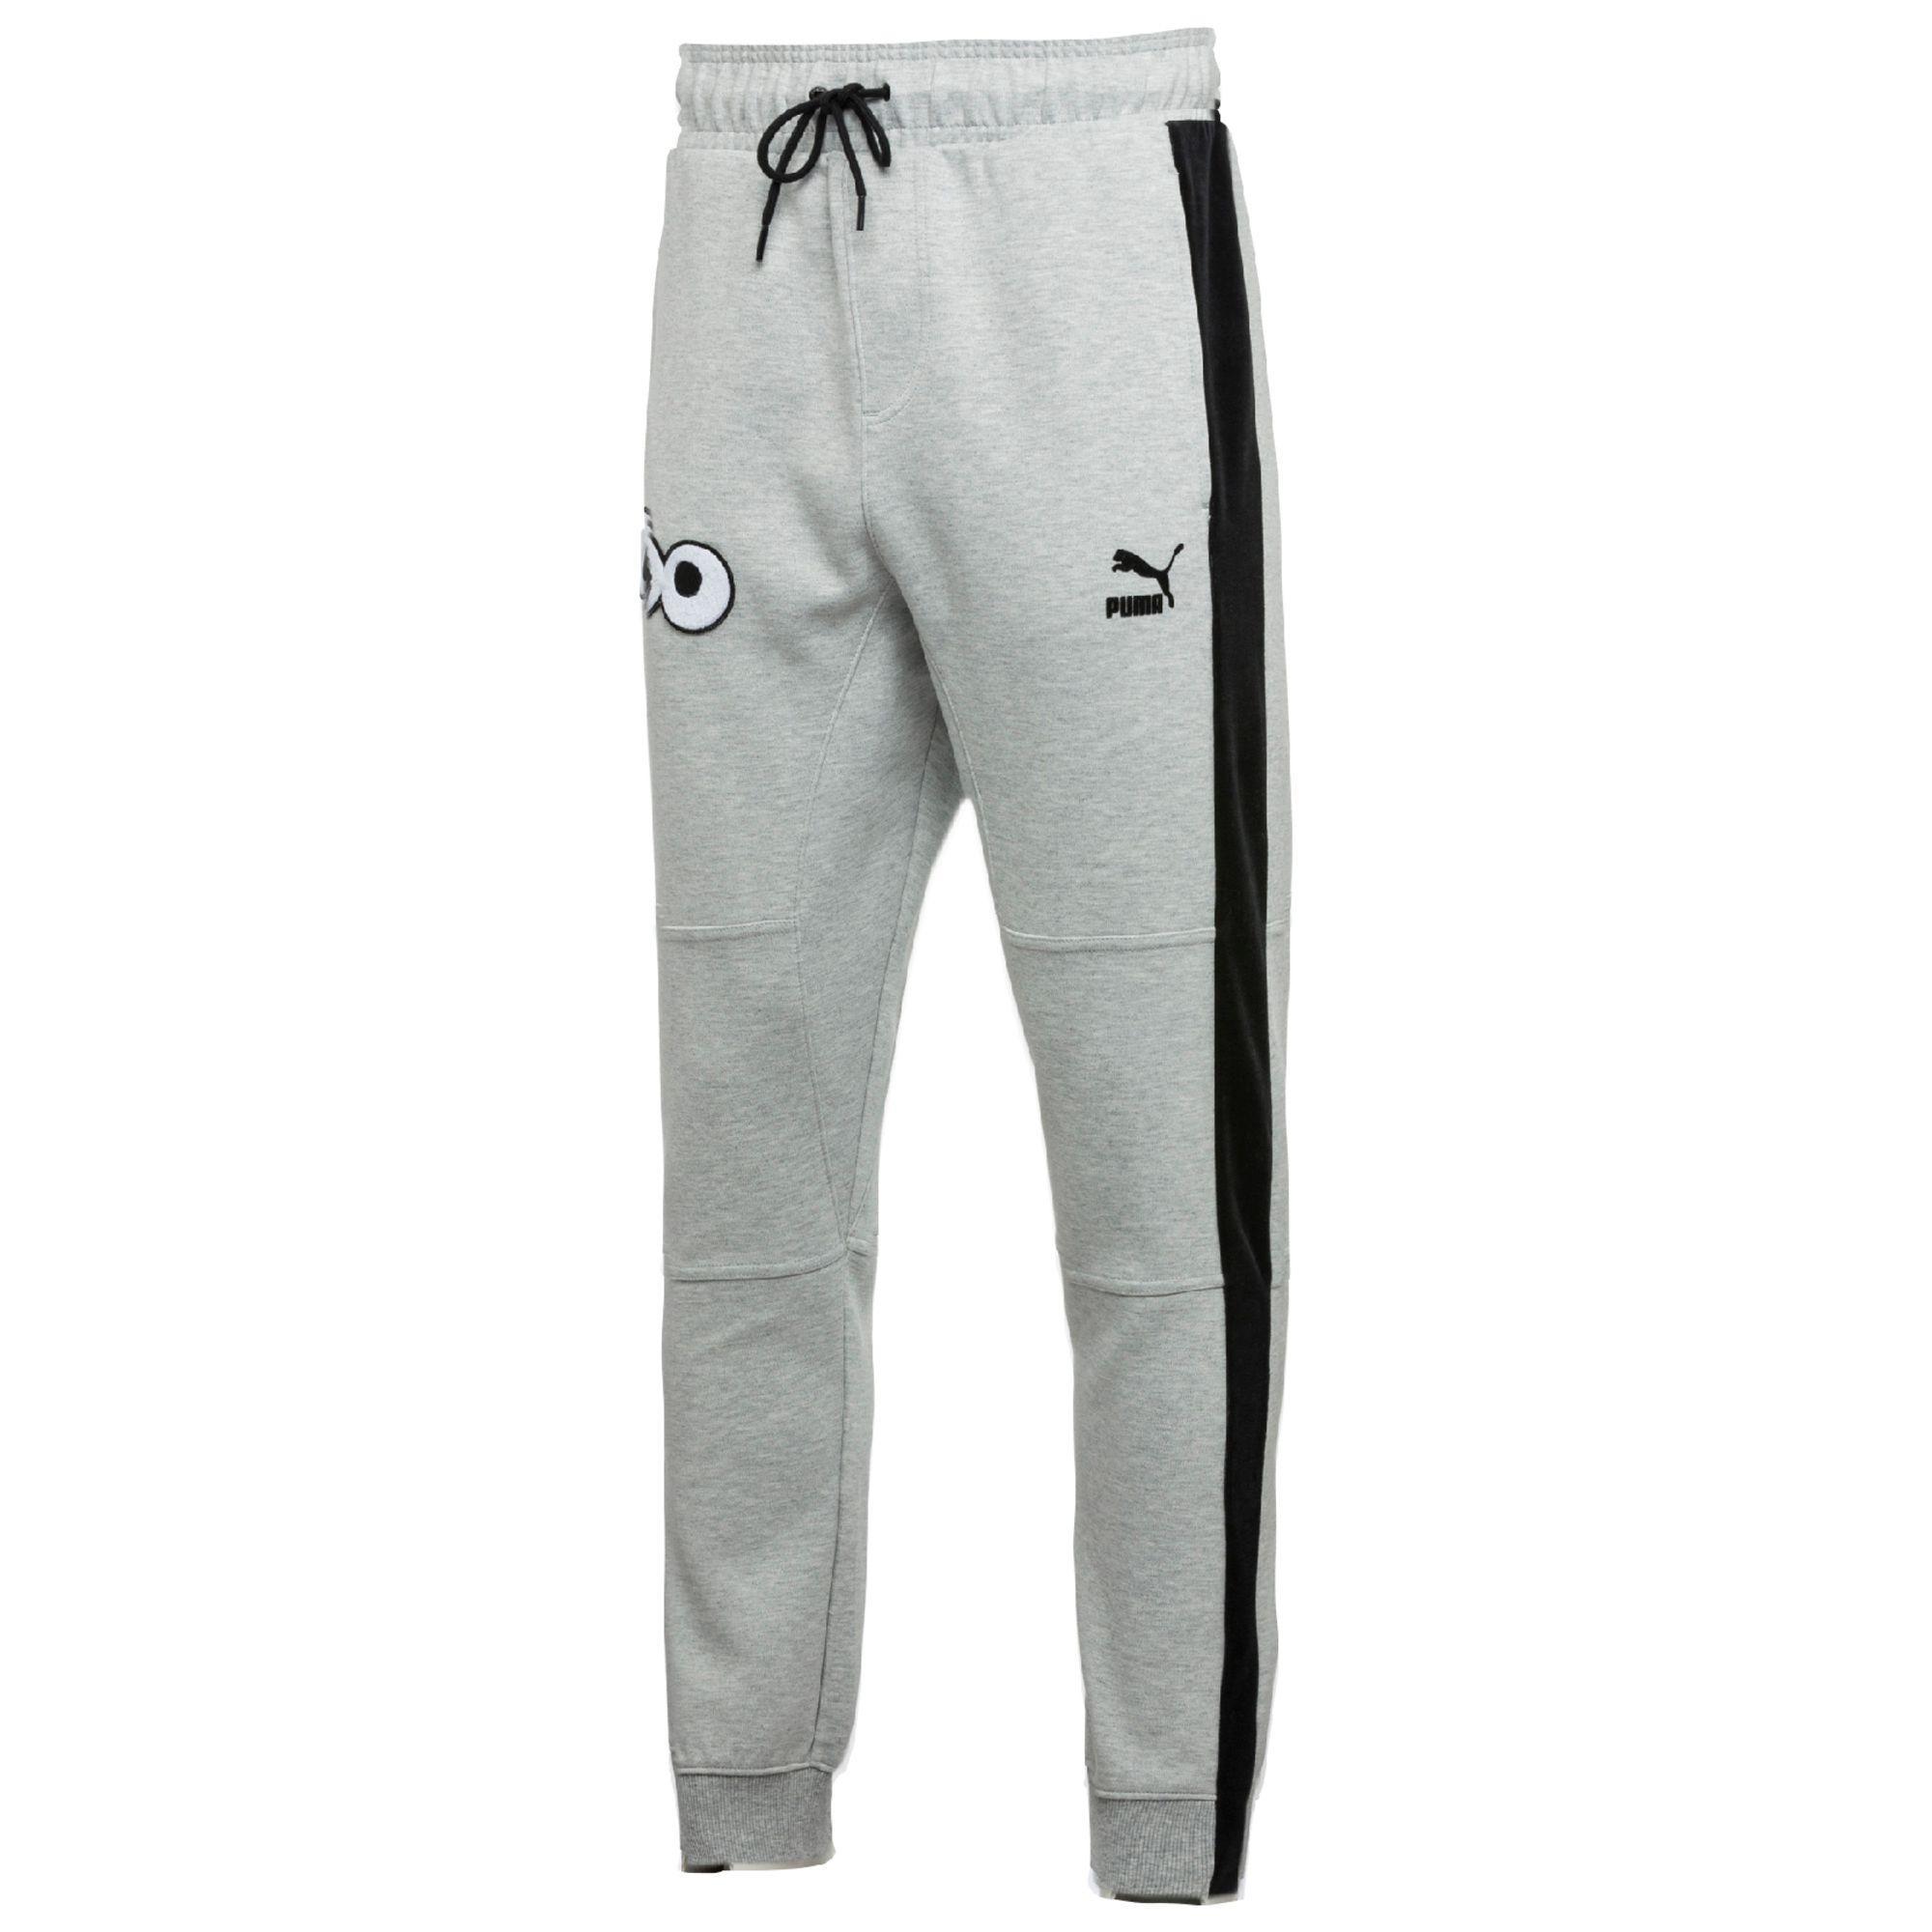 53891926072e78 Lyst - PUMA X Sesame Street Pants in Gray for Men